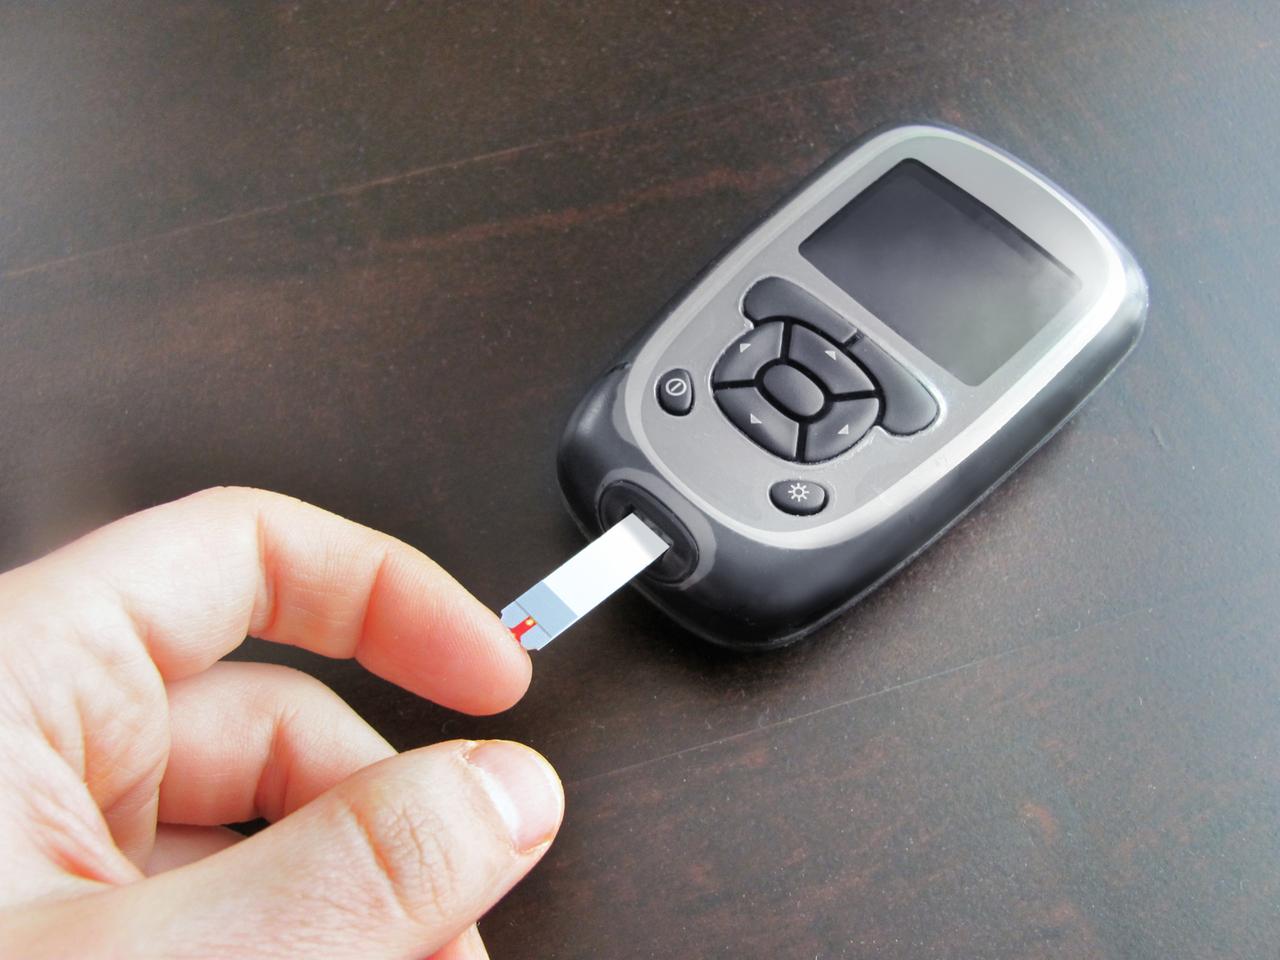 Gestational diabetes home test range